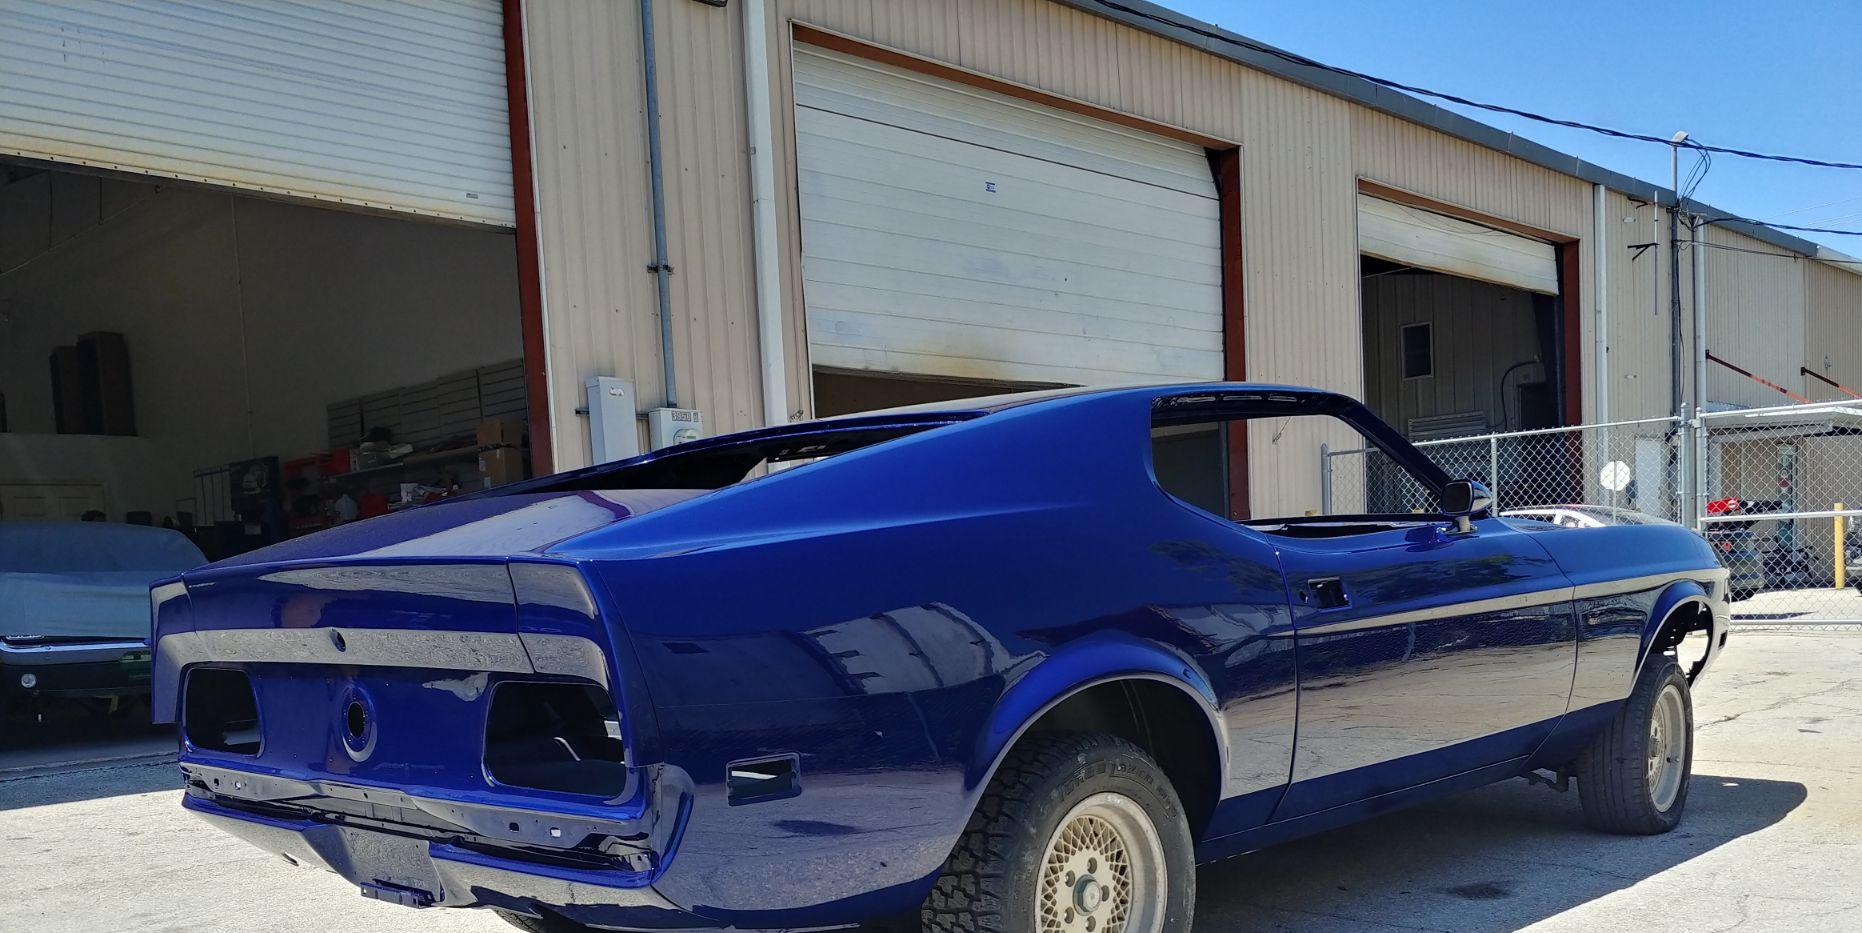 1973 Mustang - rear view